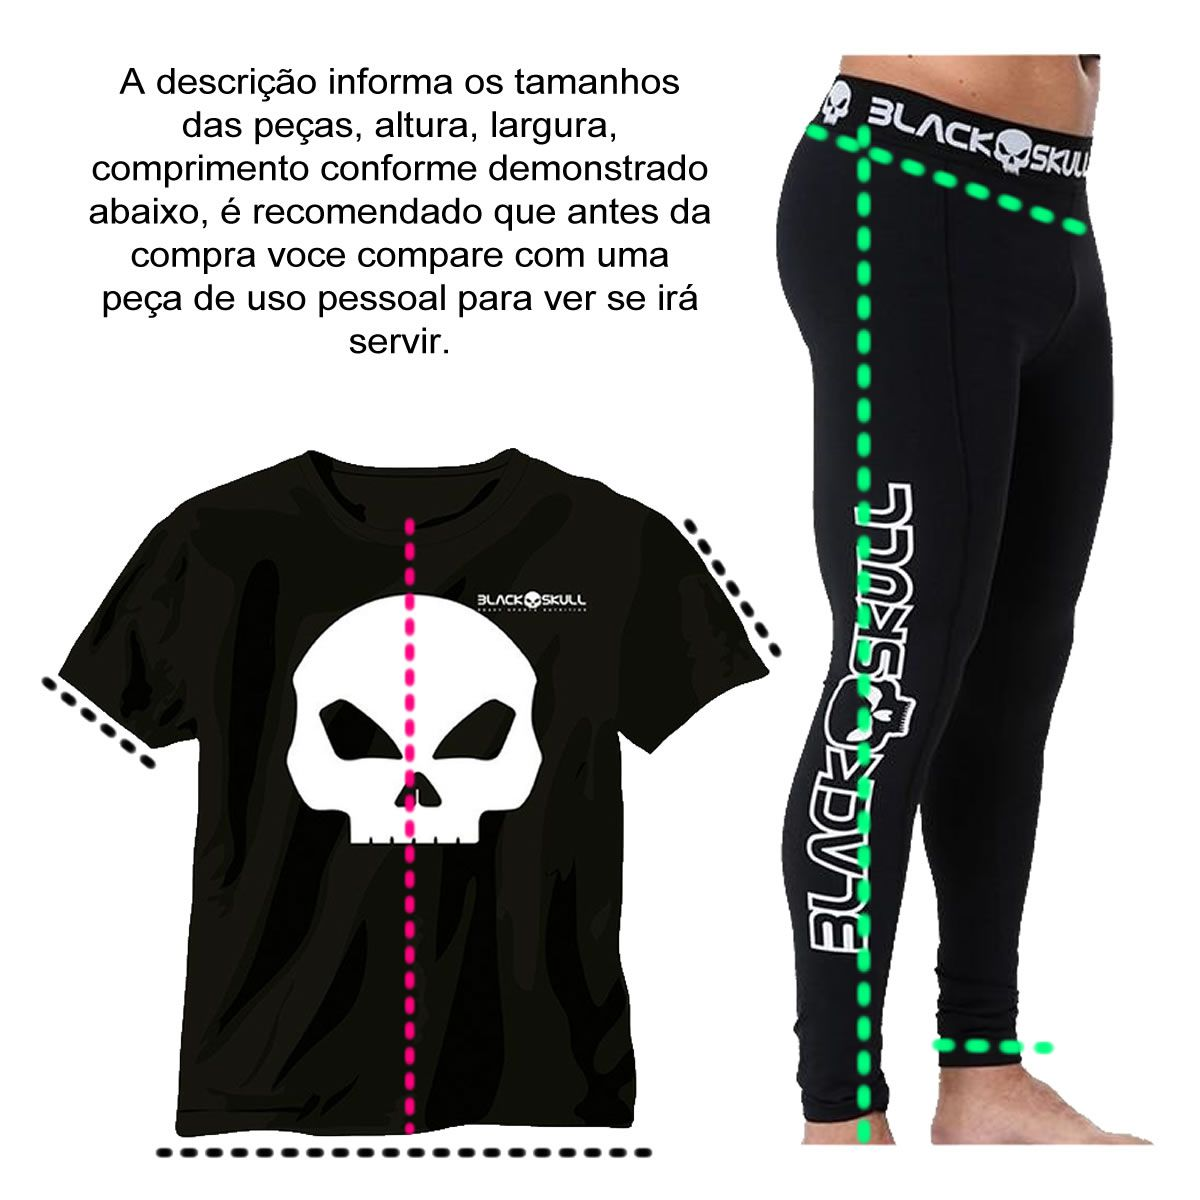 Colete Squadrow Preto - Black Skull